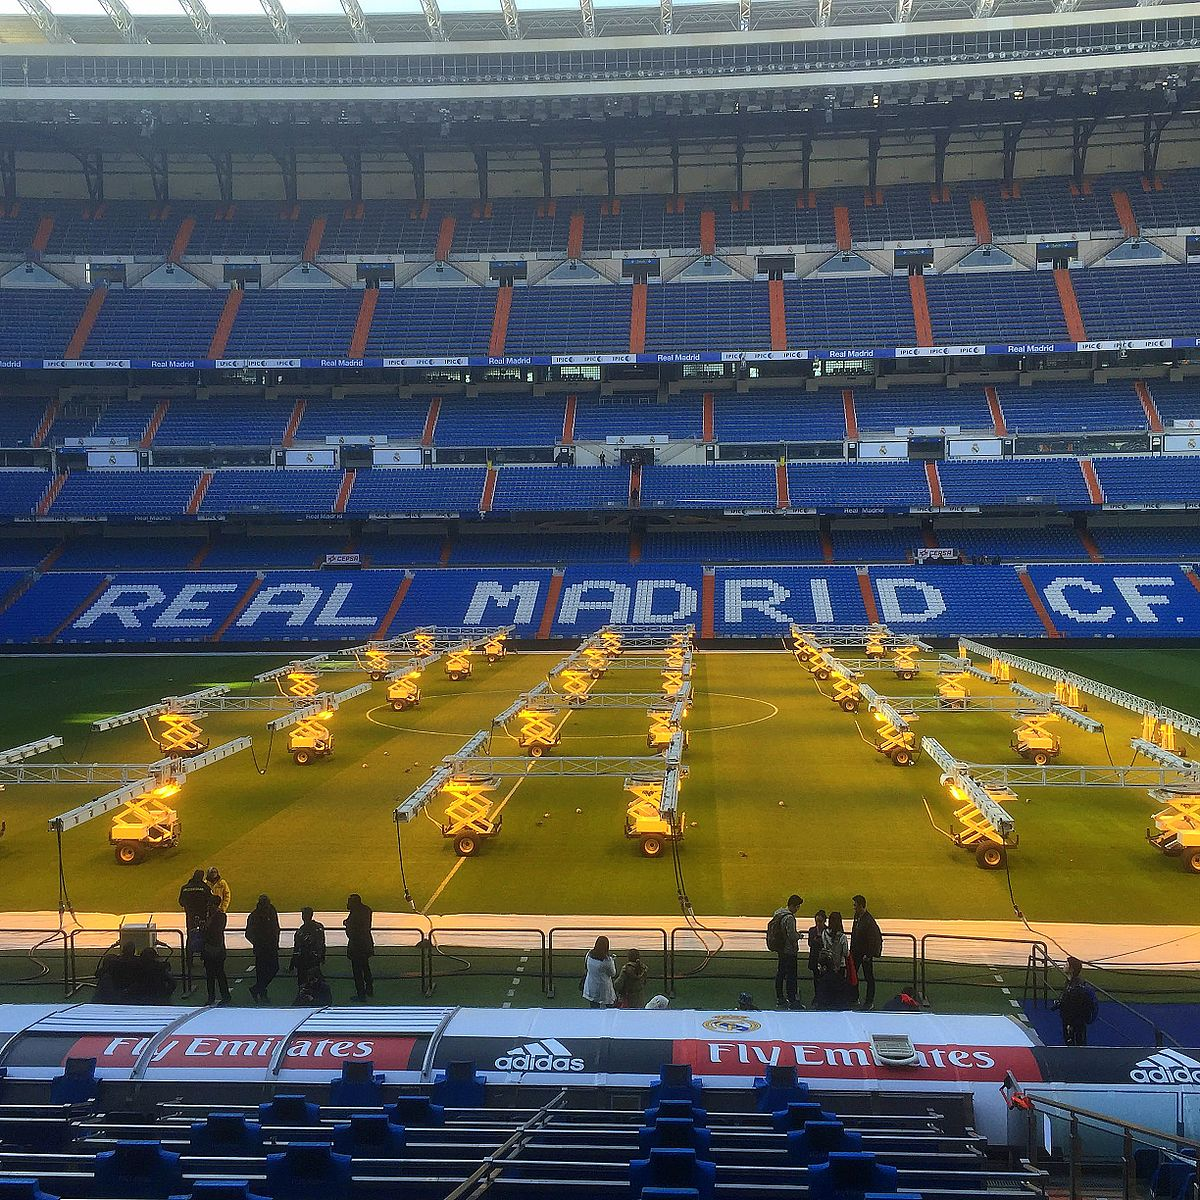 Real Madrid C.F. - Wikipédia